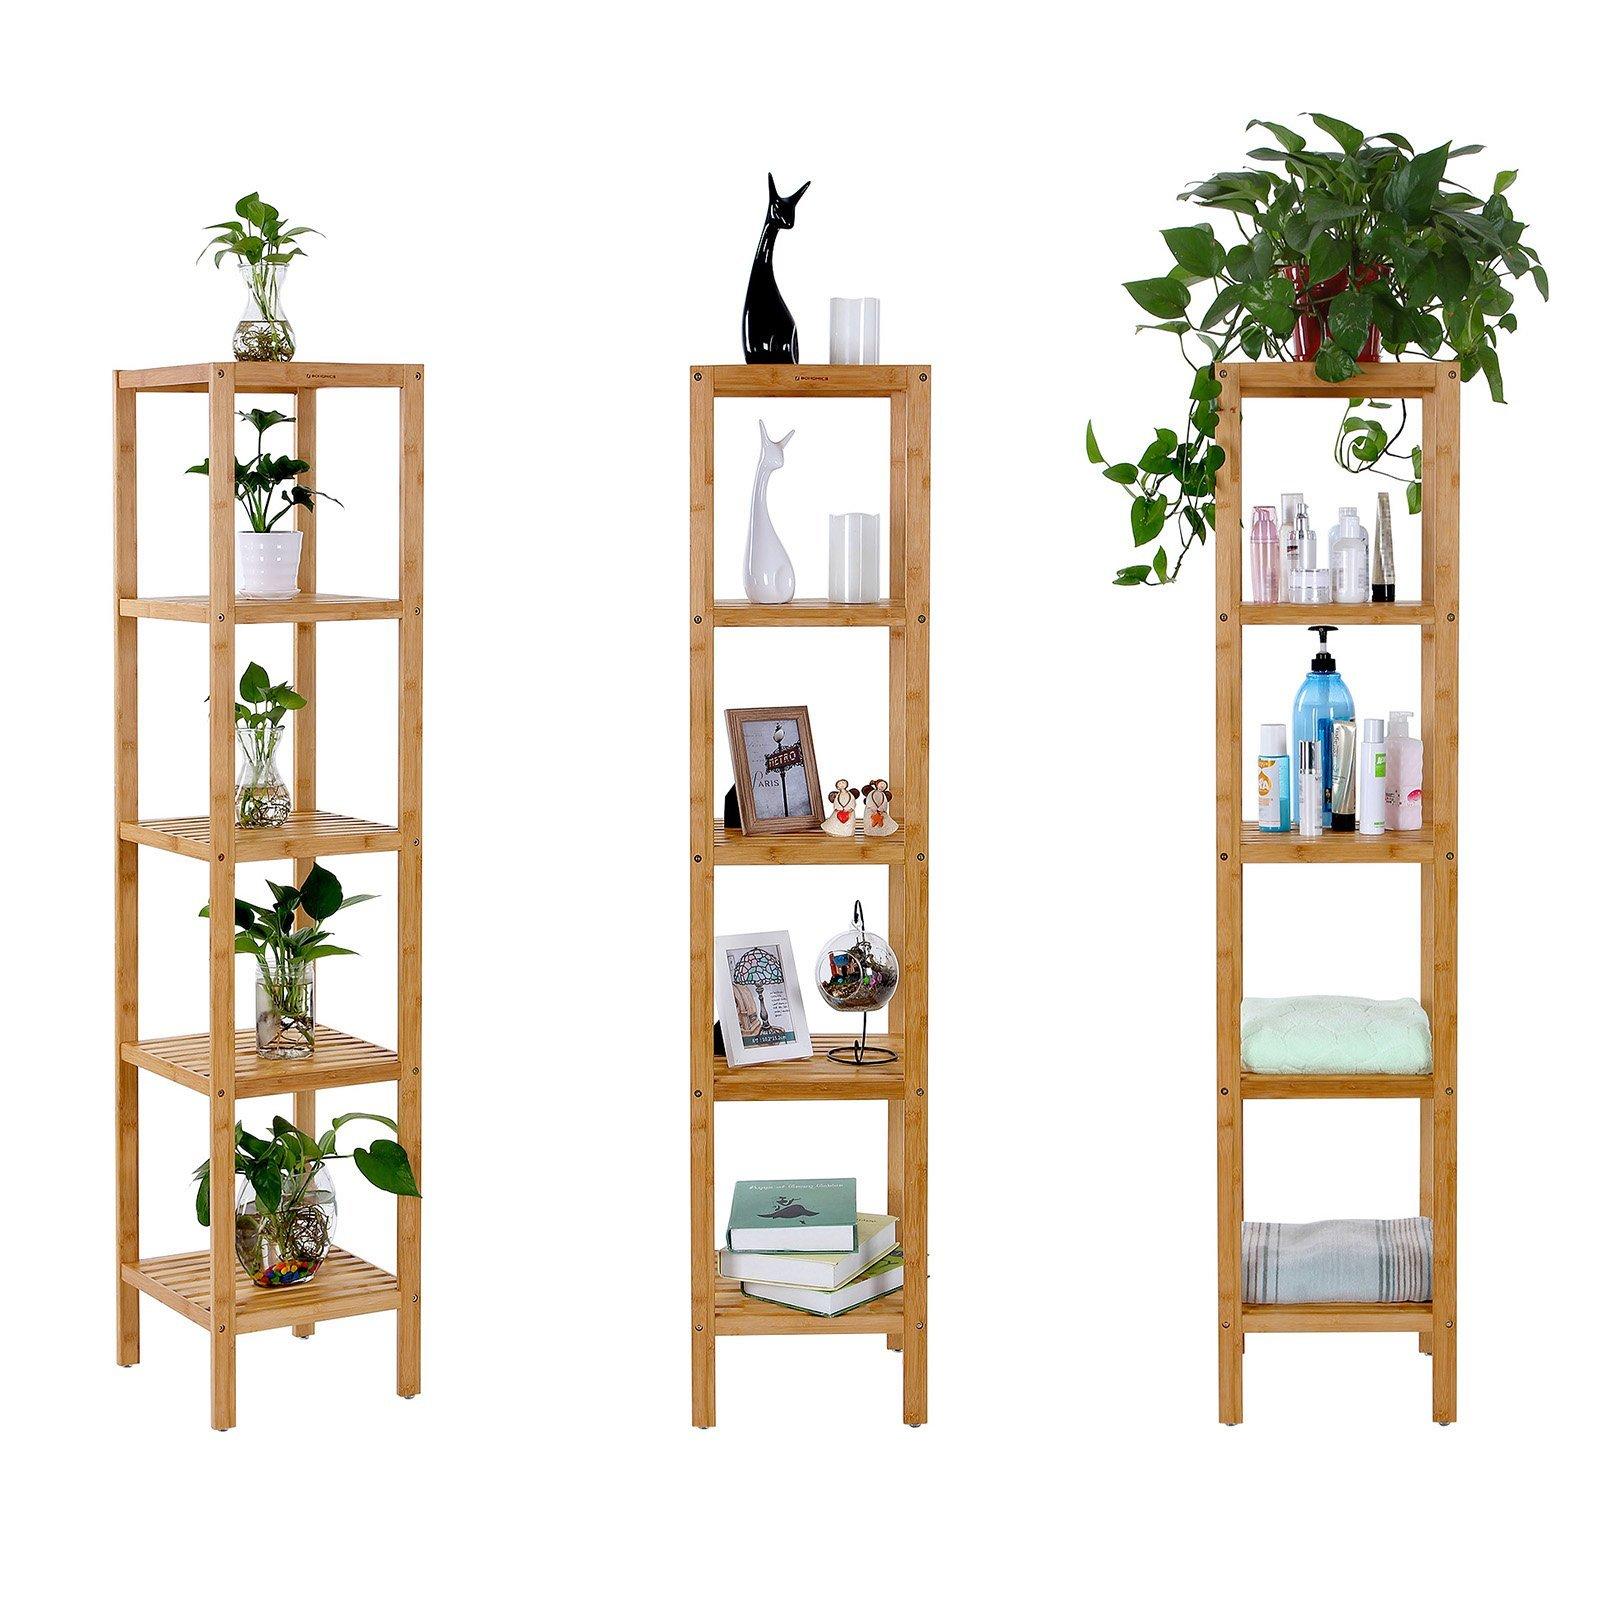 SONGMICS Narrow Shelving Unit Bathroom Shelf 5-Tier Multifunctional Storage 100% Bamboo Wood Corner Rack for Kitchen Livingroom Bedroom UBCB55Y by SONGMICS (Image #4)